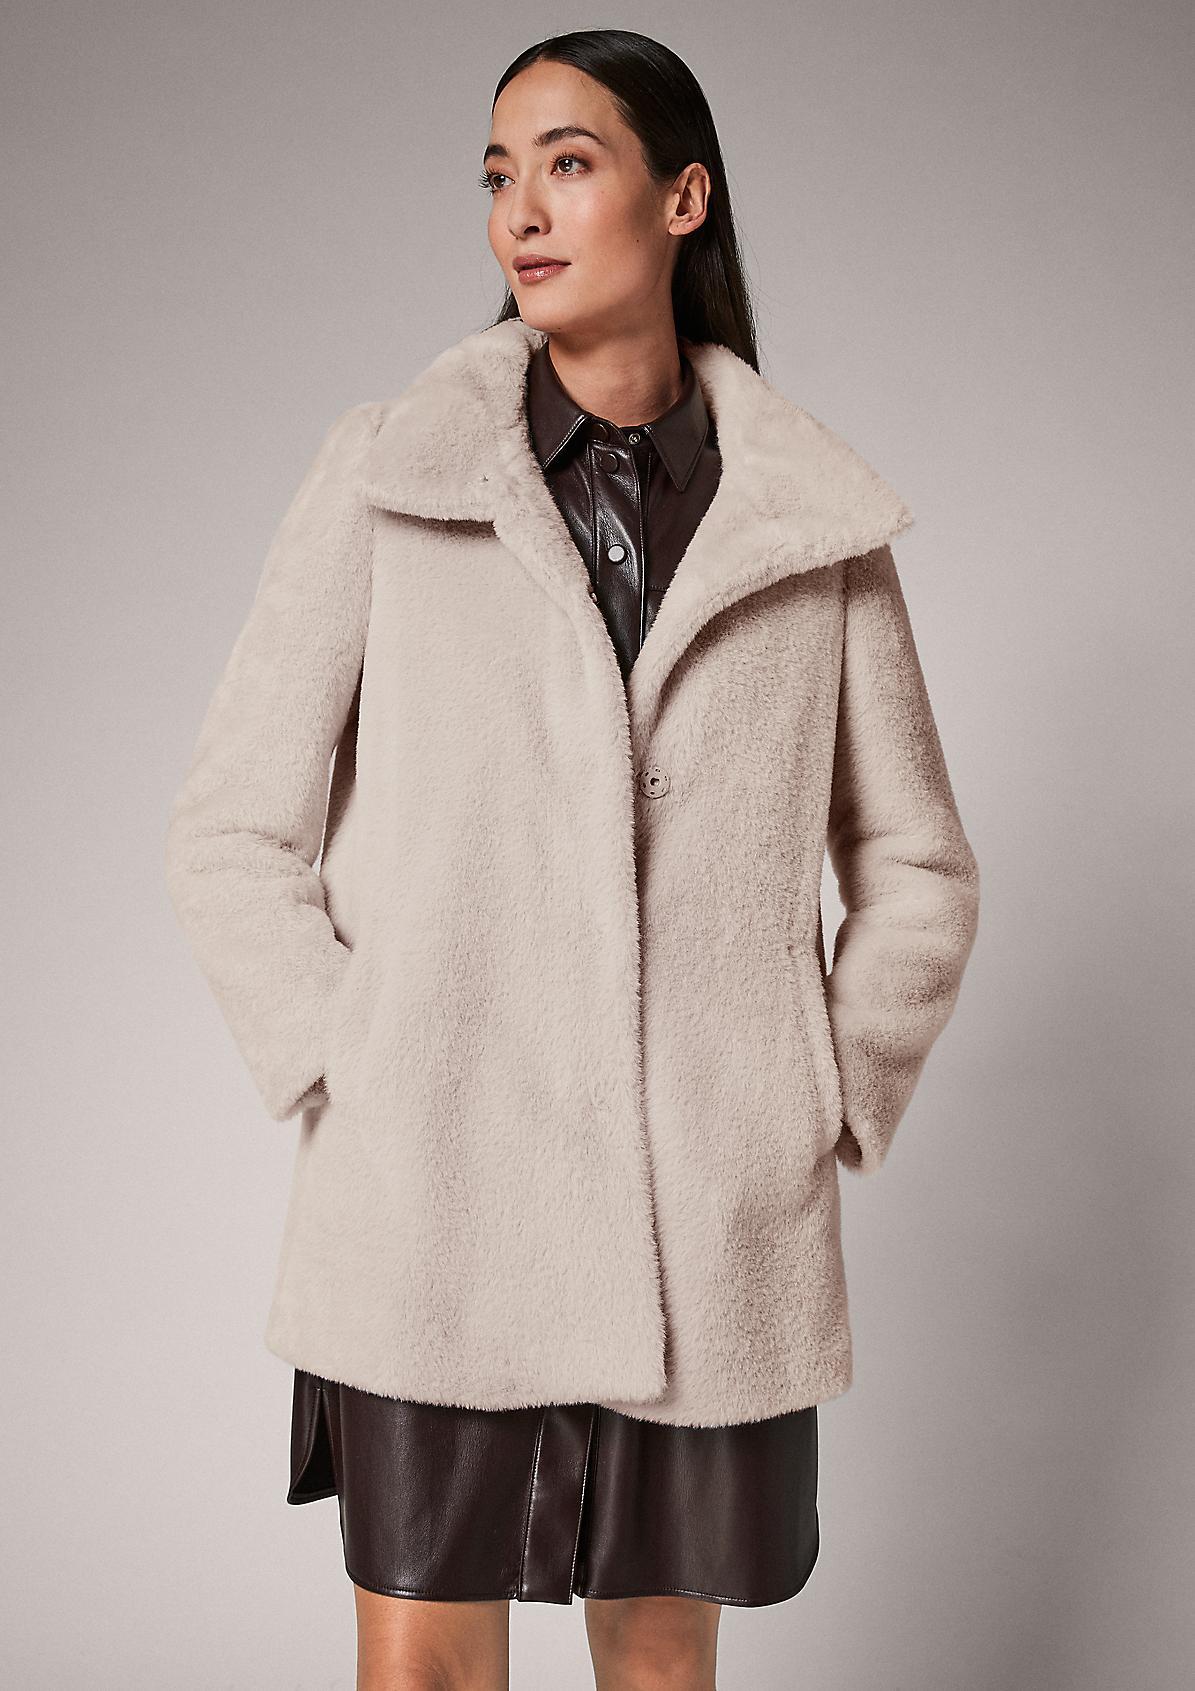 Weiche Jacke aus Kunstfell